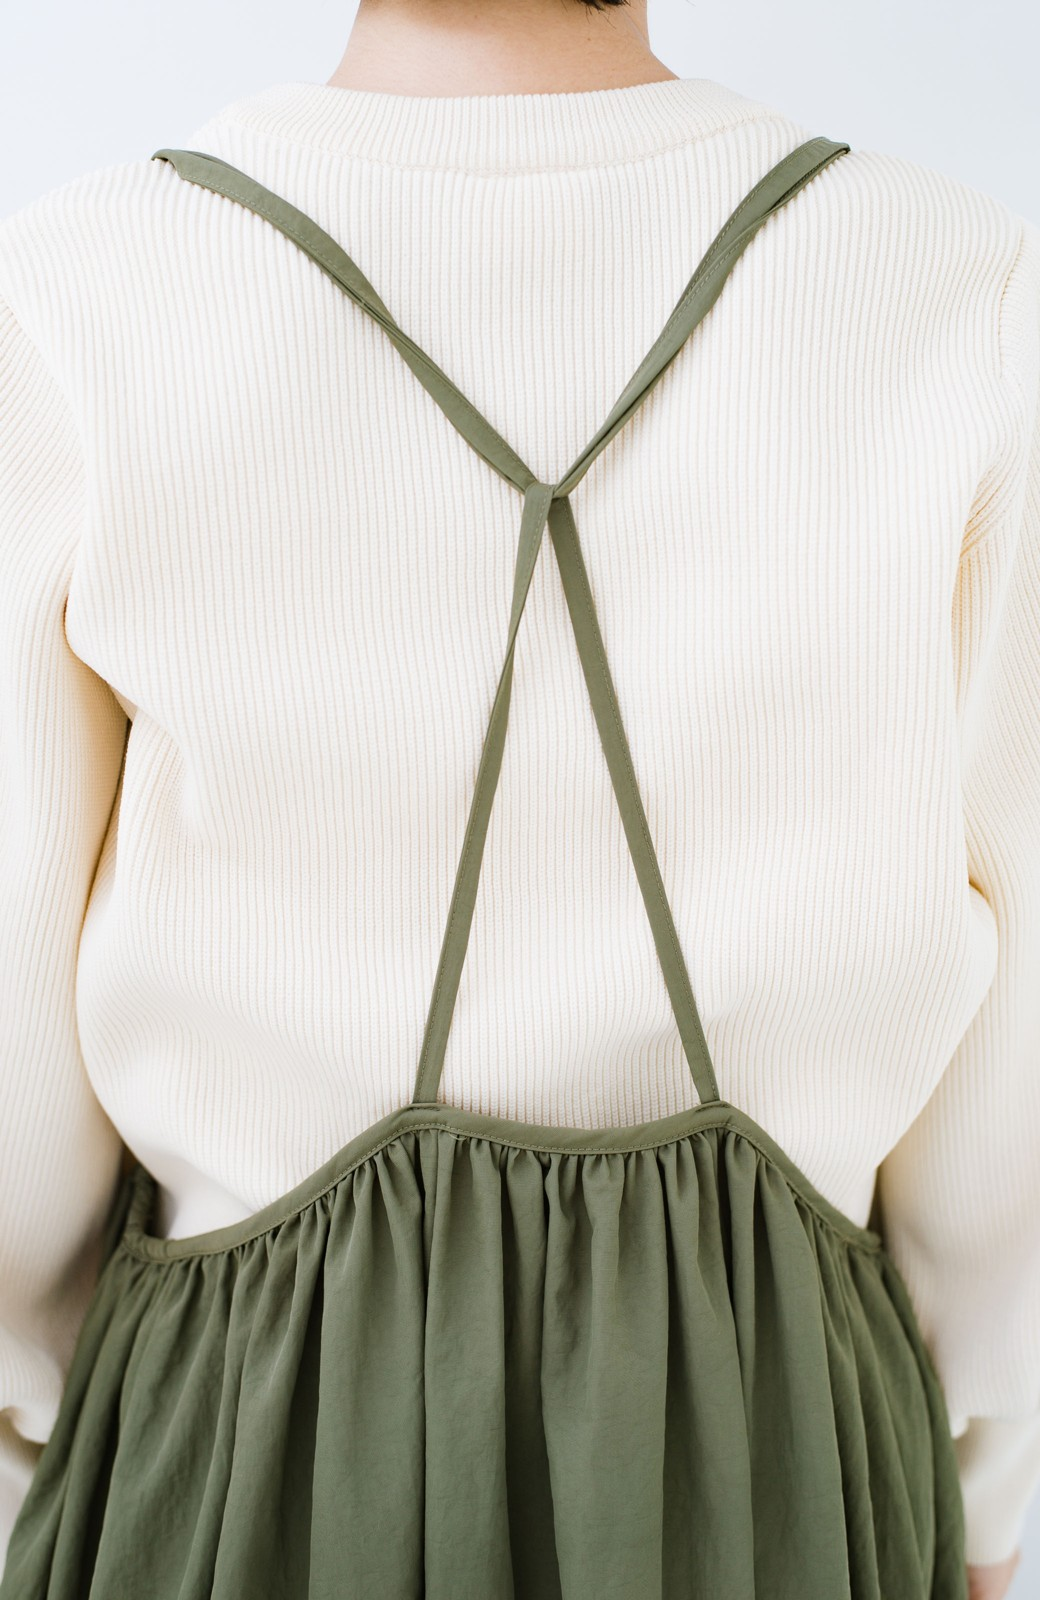 haco! 女の子バンザイ!プロジェクト【ブルー期】 ニットですら重ね着できる安心さ ゆったりギャザーキャミワンピ <カーキ>の商品写真13